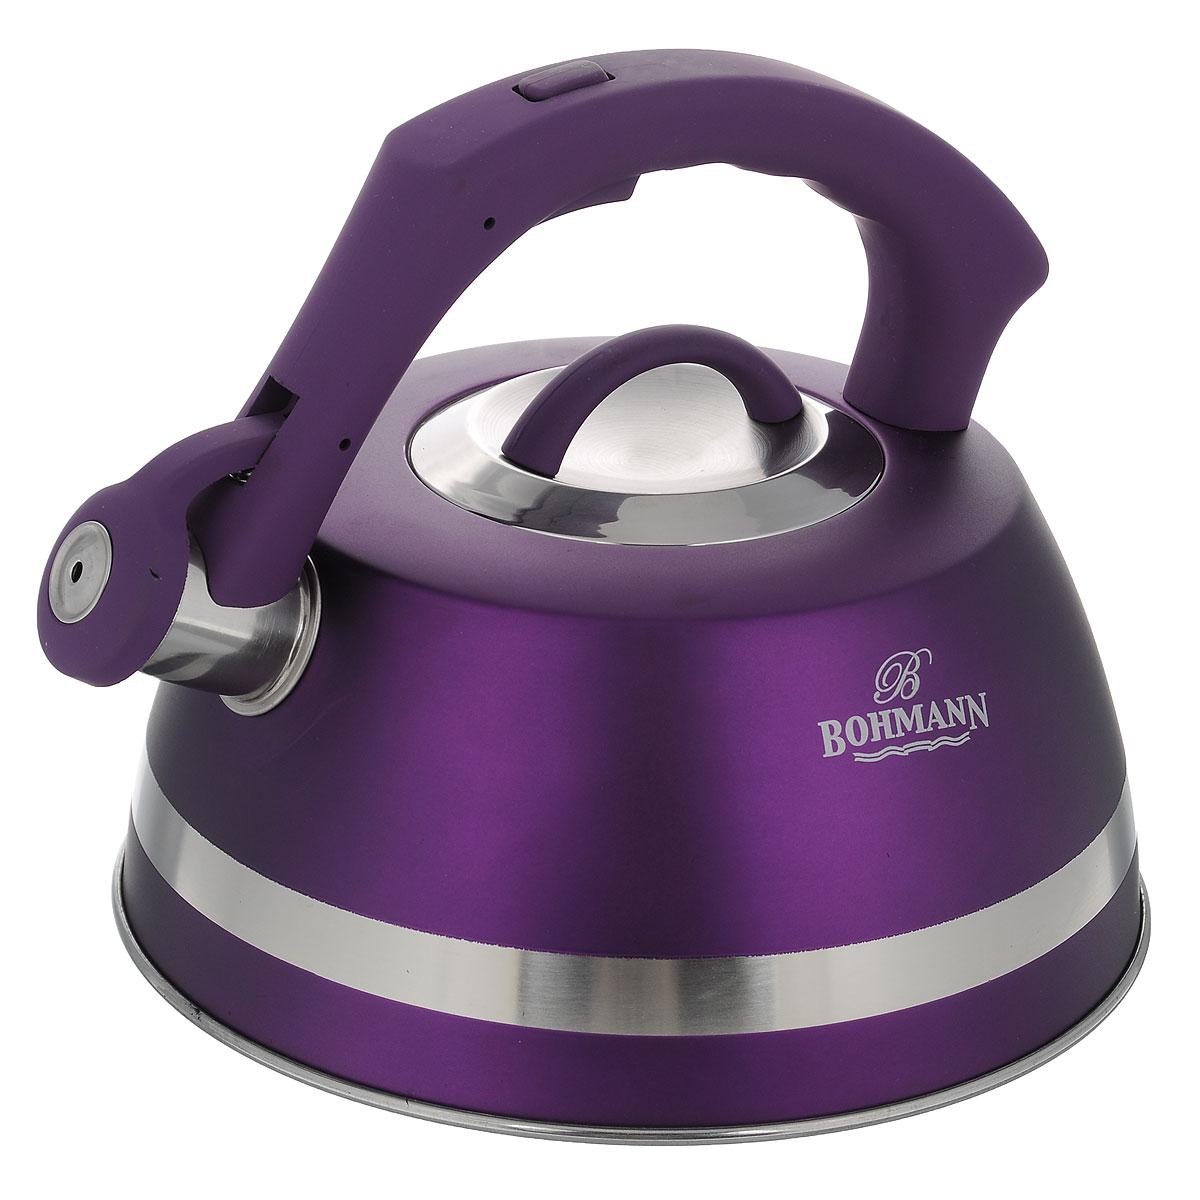 Чайник Bohmann со свистком, цвет: фиолетовый, 3,5 л. BH - 9967BH - 9967